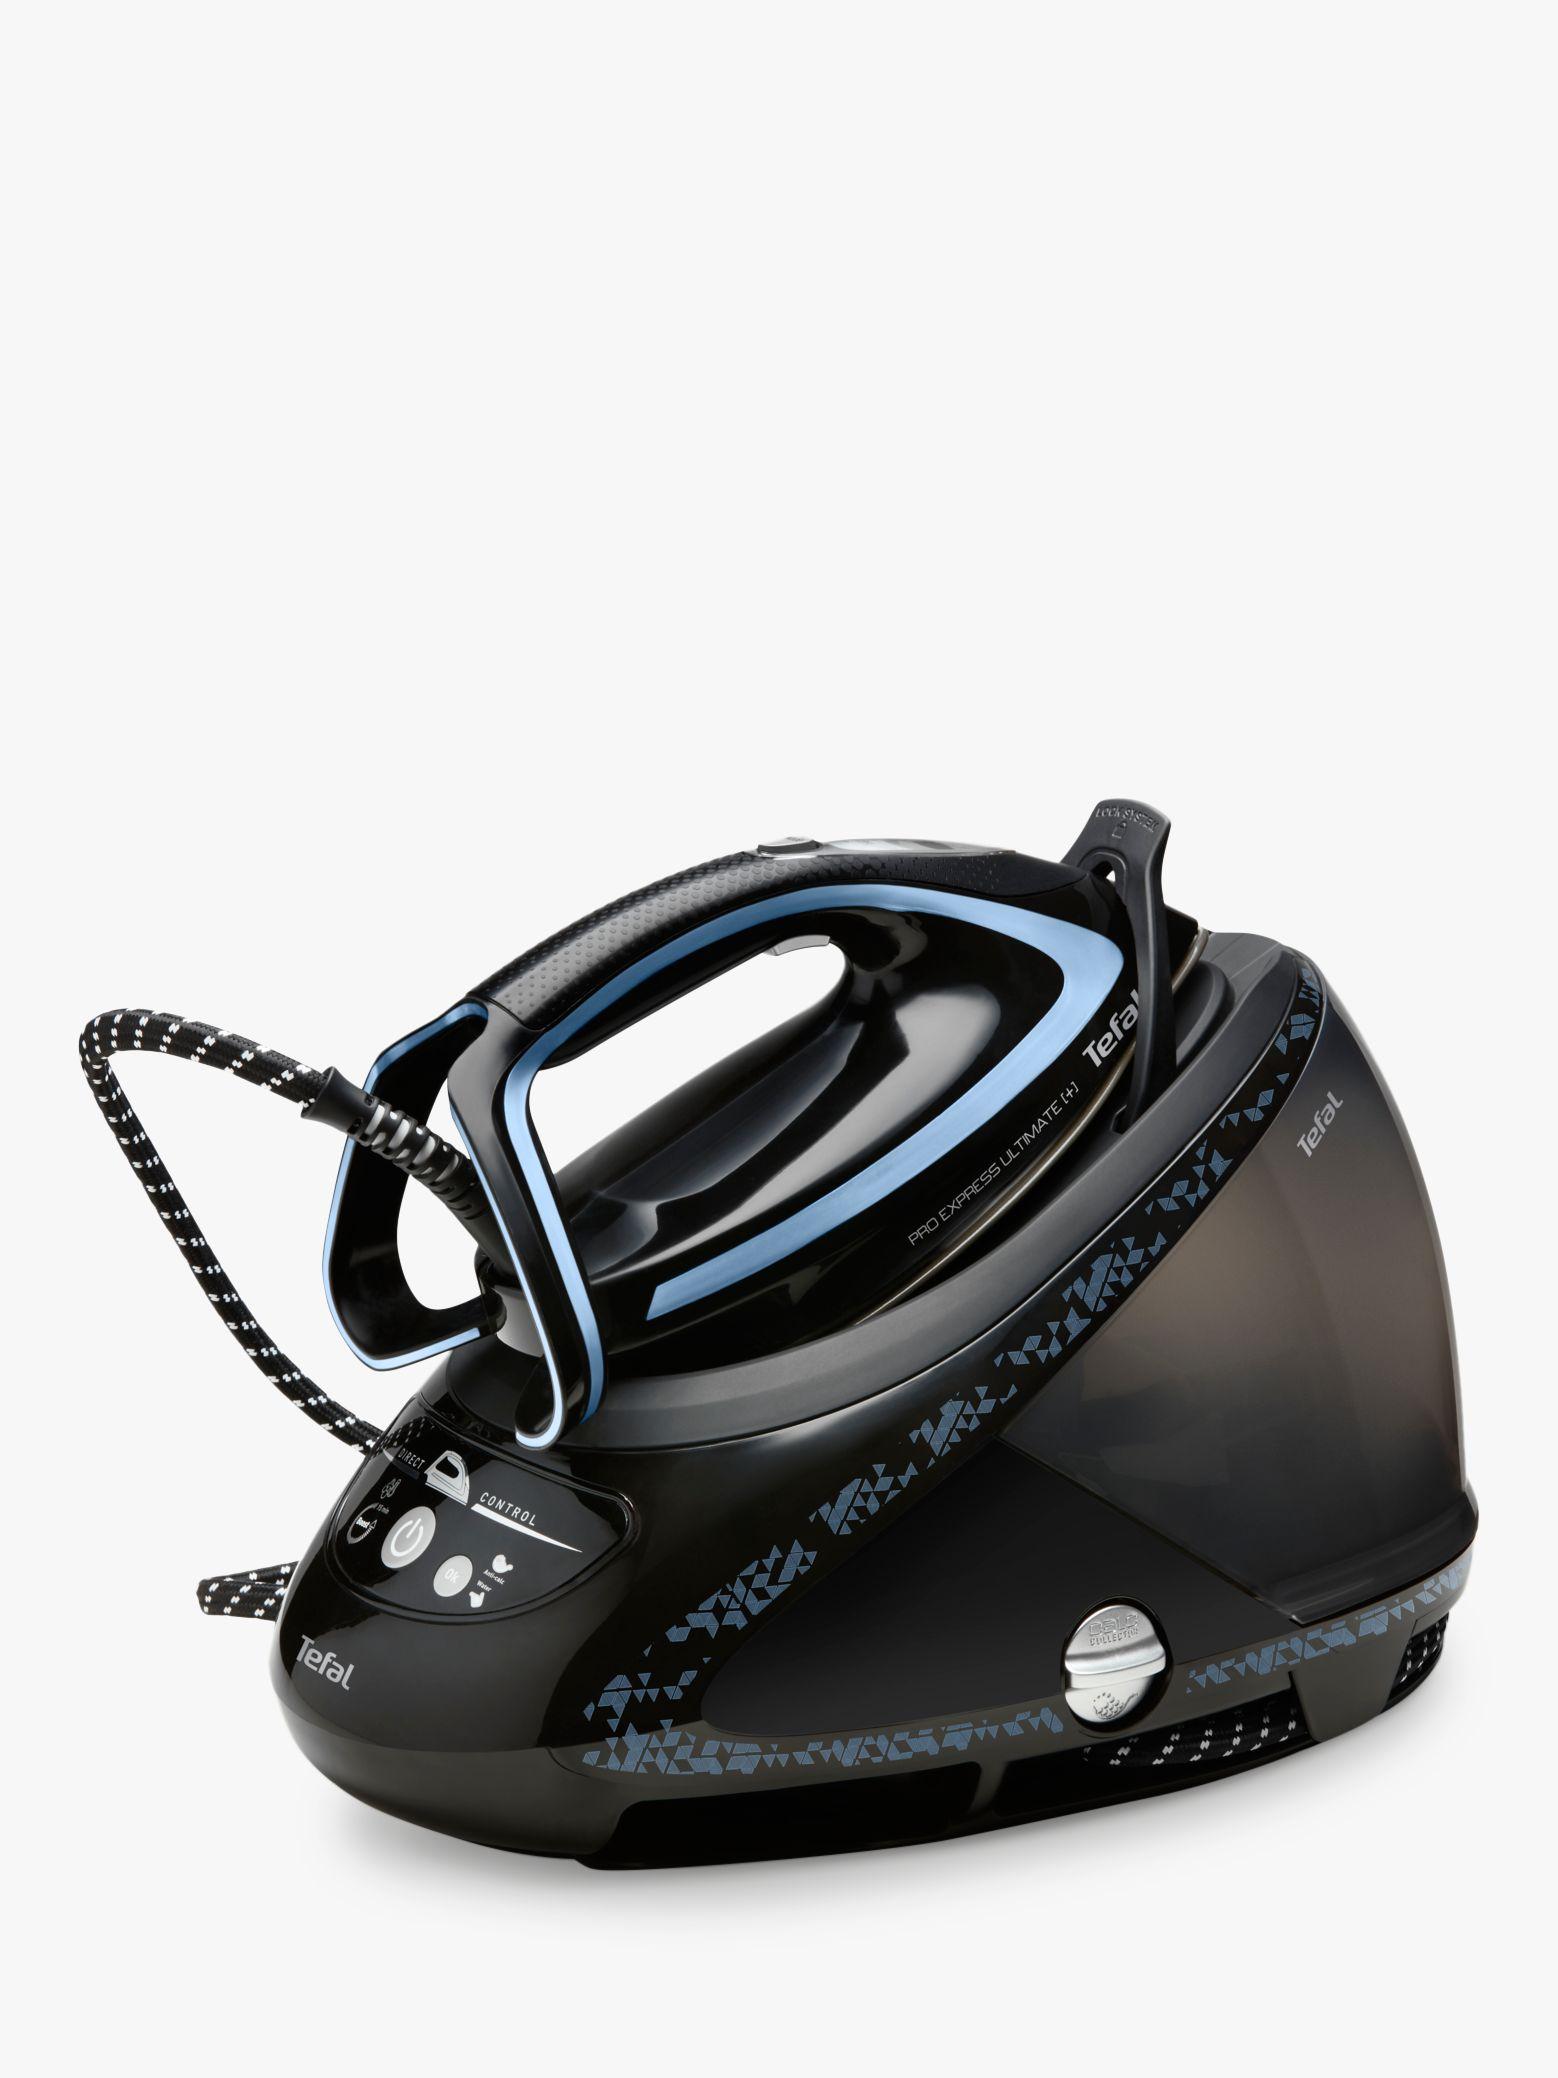 Tefal Tefal GV9611G0 Pro Express Ultimate+ Iron, Black